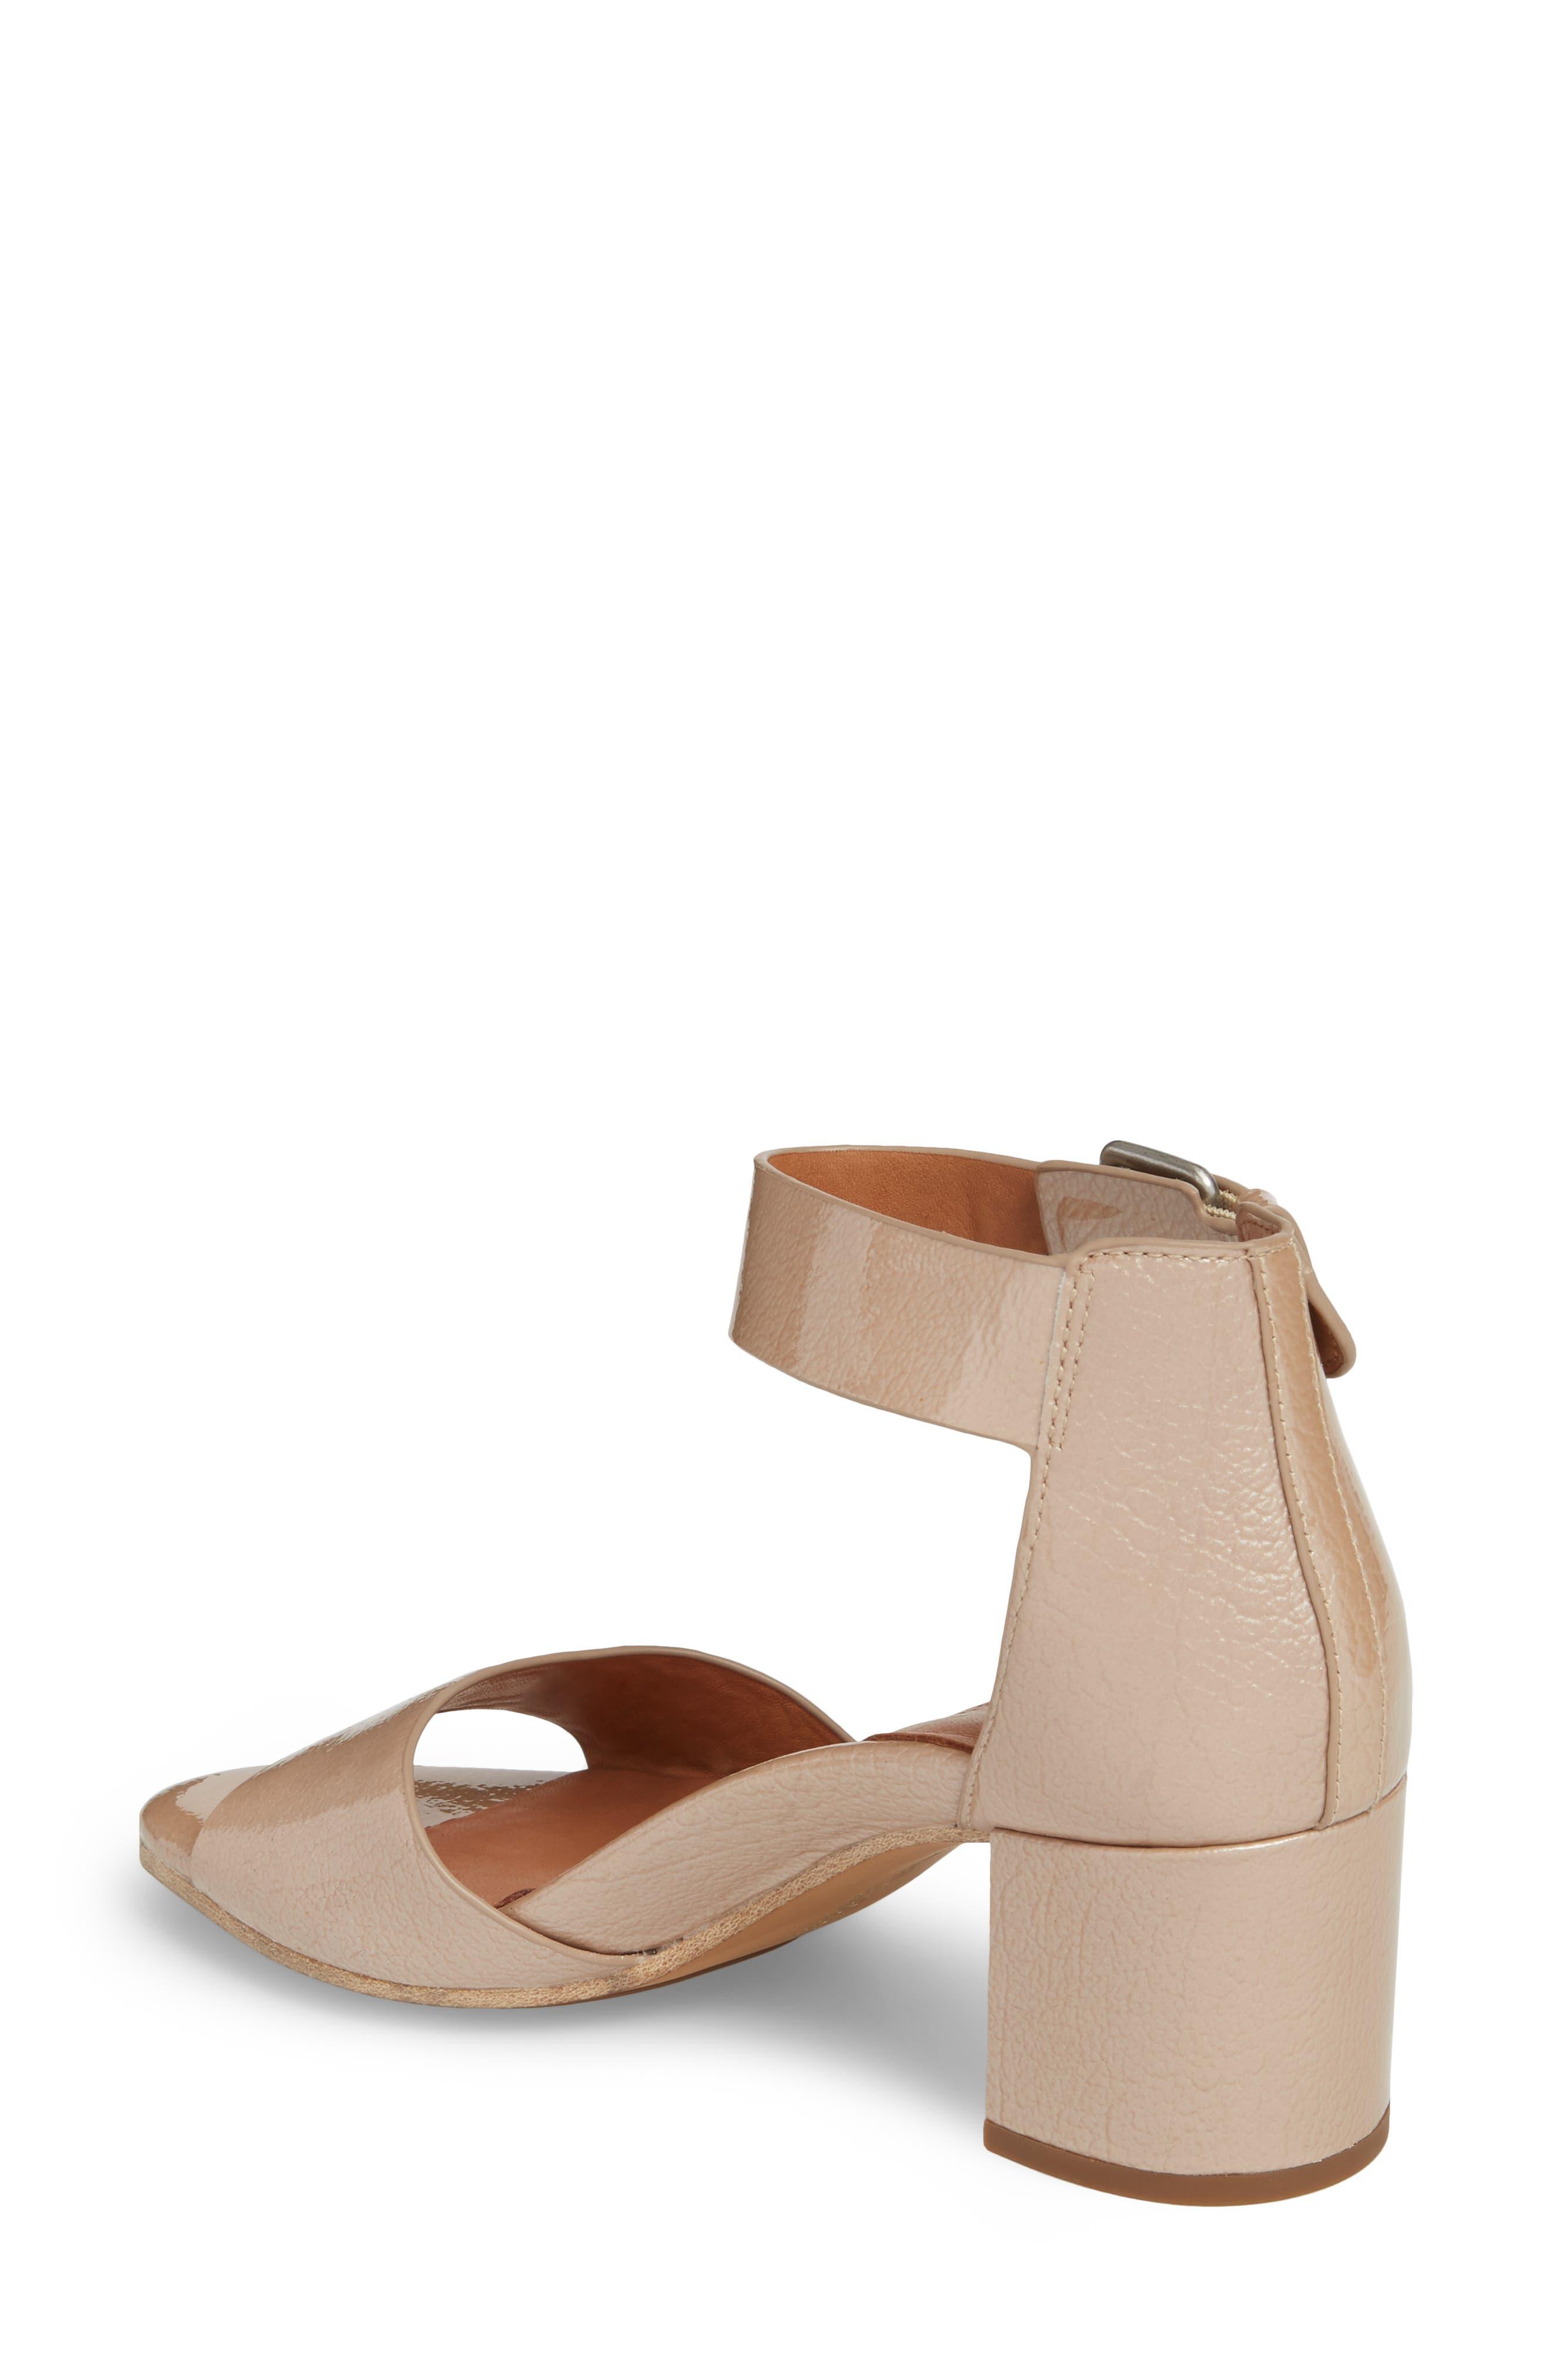 Christa Block Heel Sandal,                             Alternate thumbnail 2, color,                             NUDE PATENT LEATHER